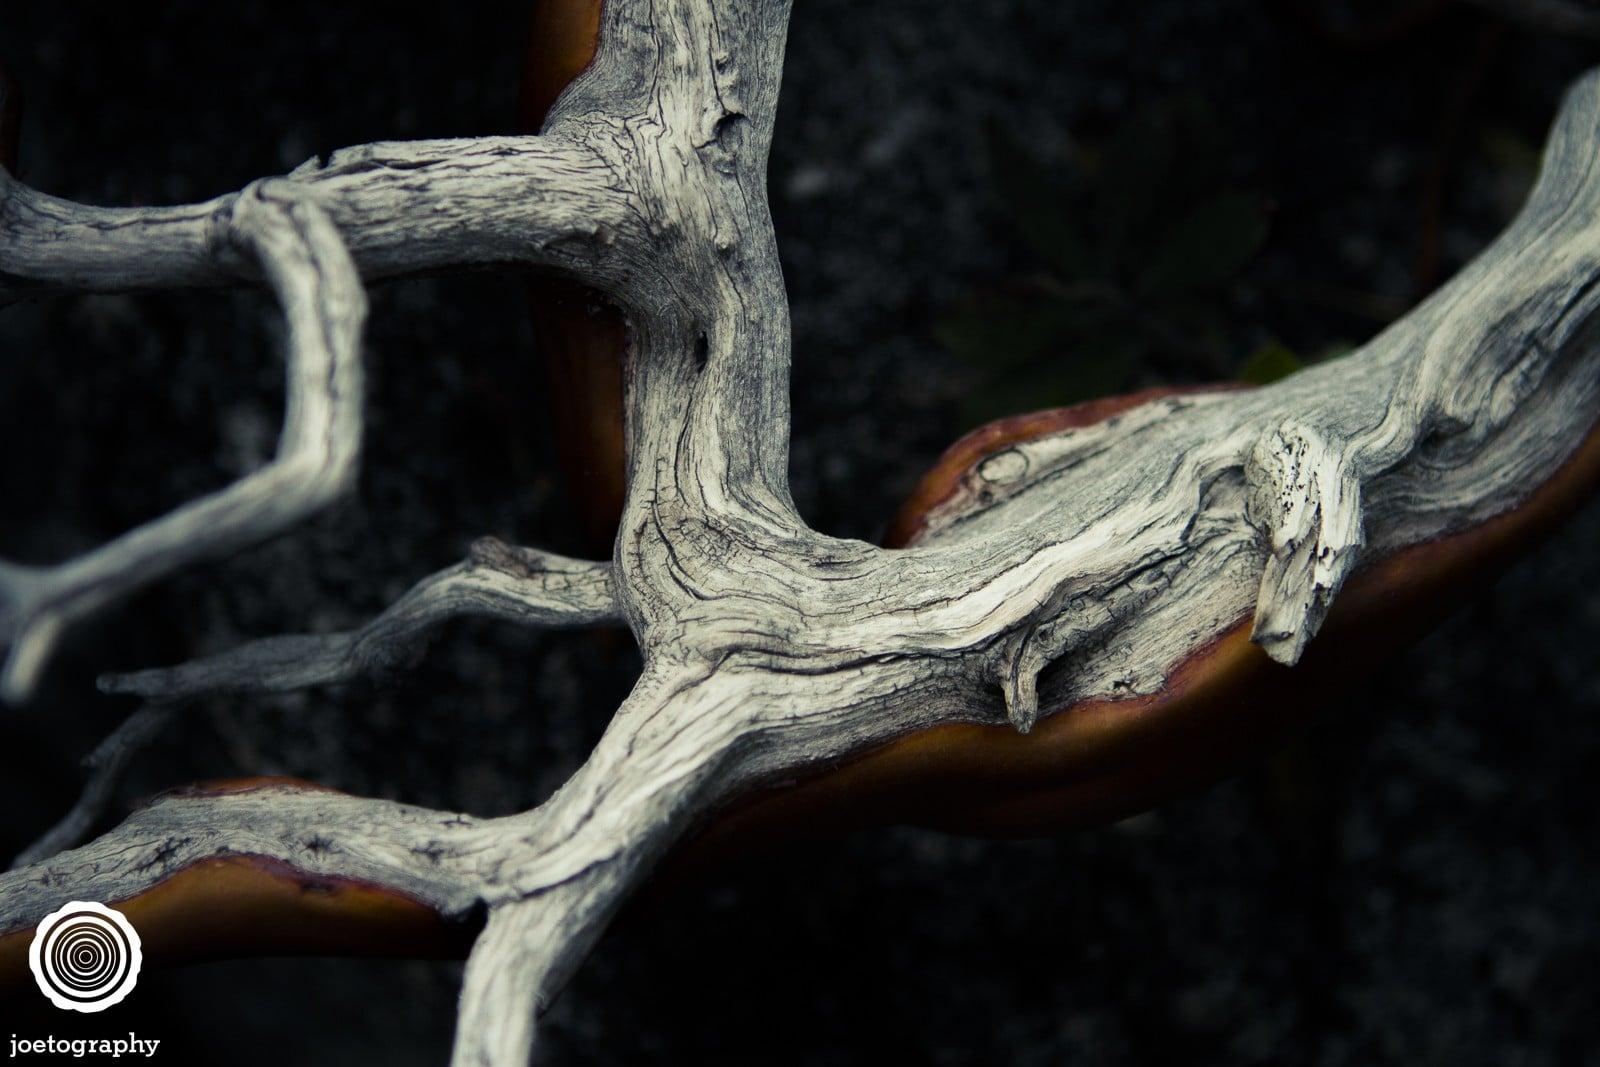 joetography-travel-photography-yosemite-2015-91